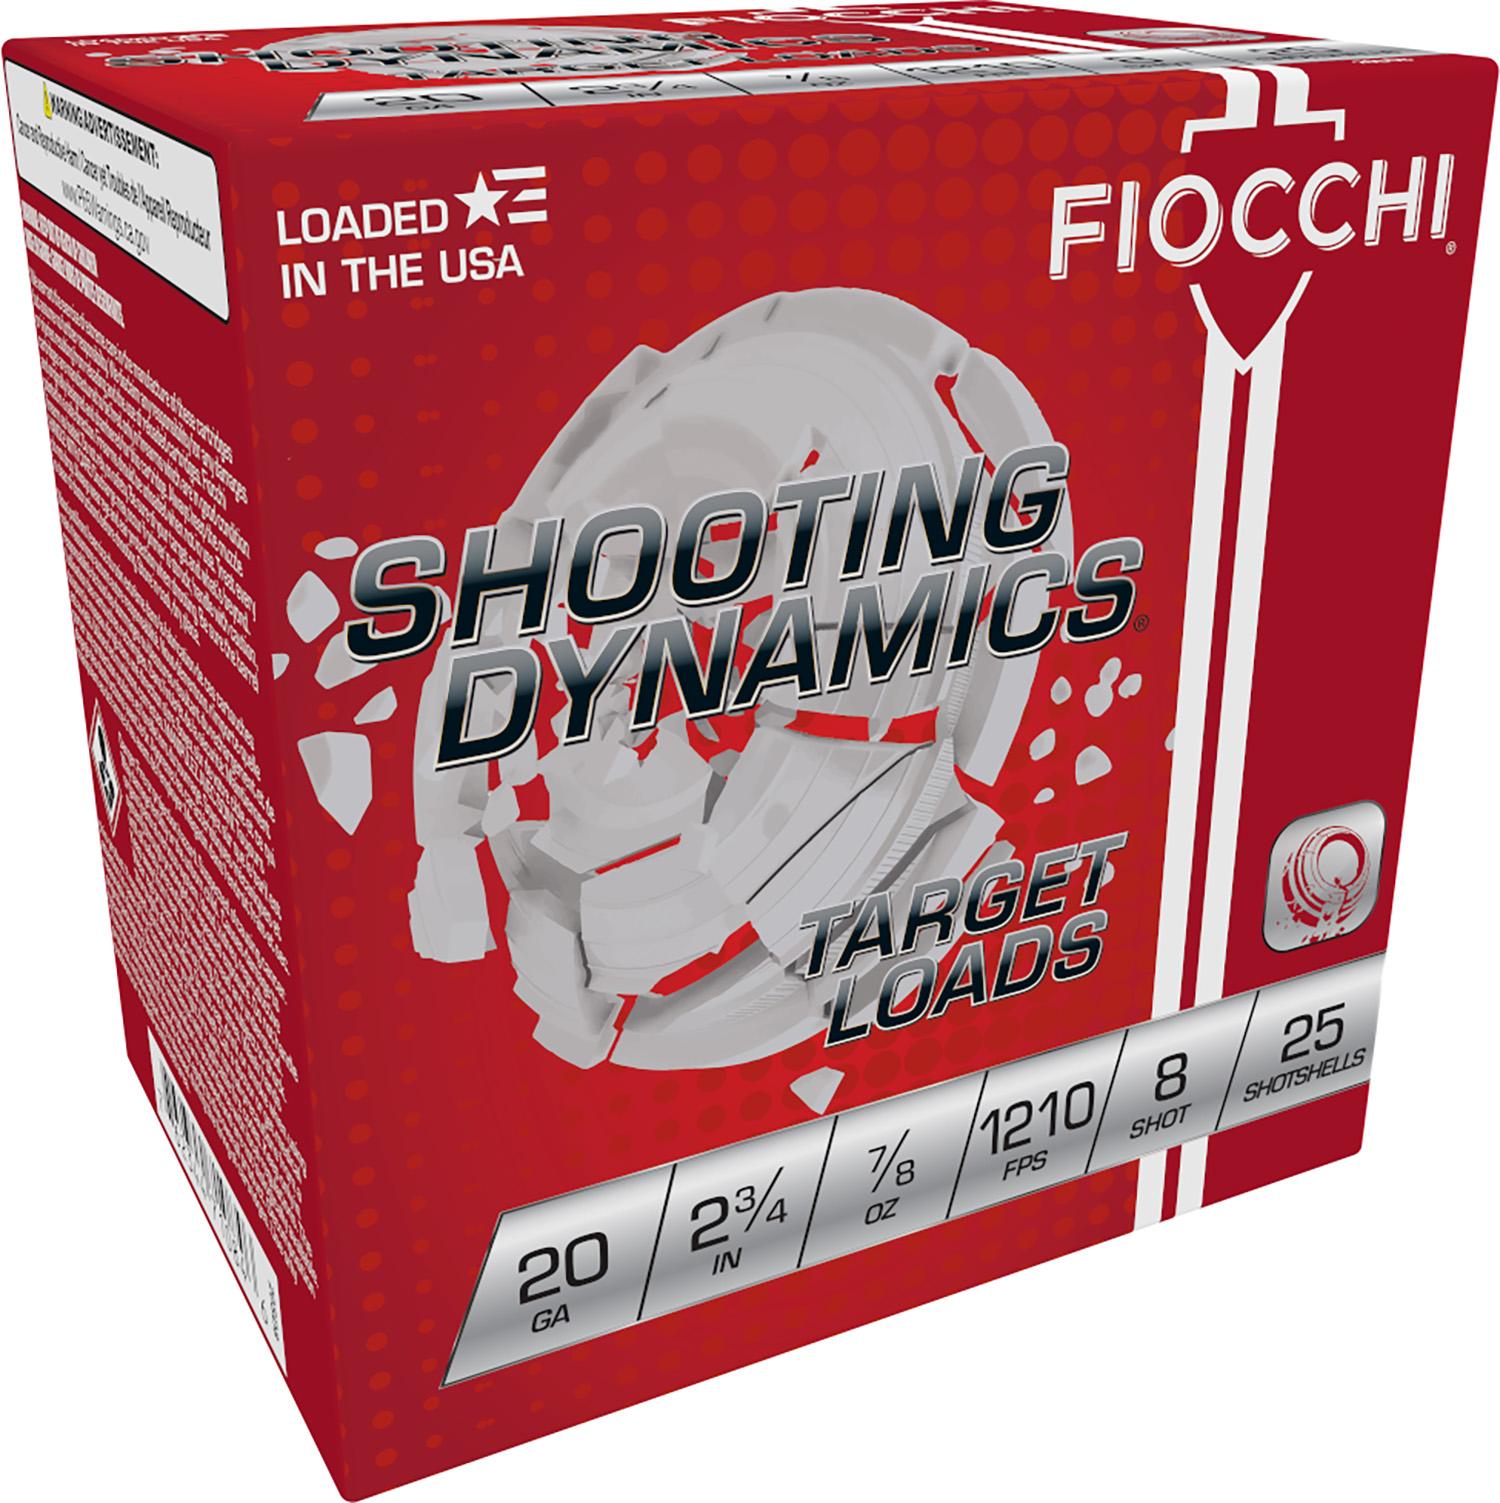 Fiocchi 20SD8 Shooting Dynamics Heavy Dynamic 20 Gauge 2.75